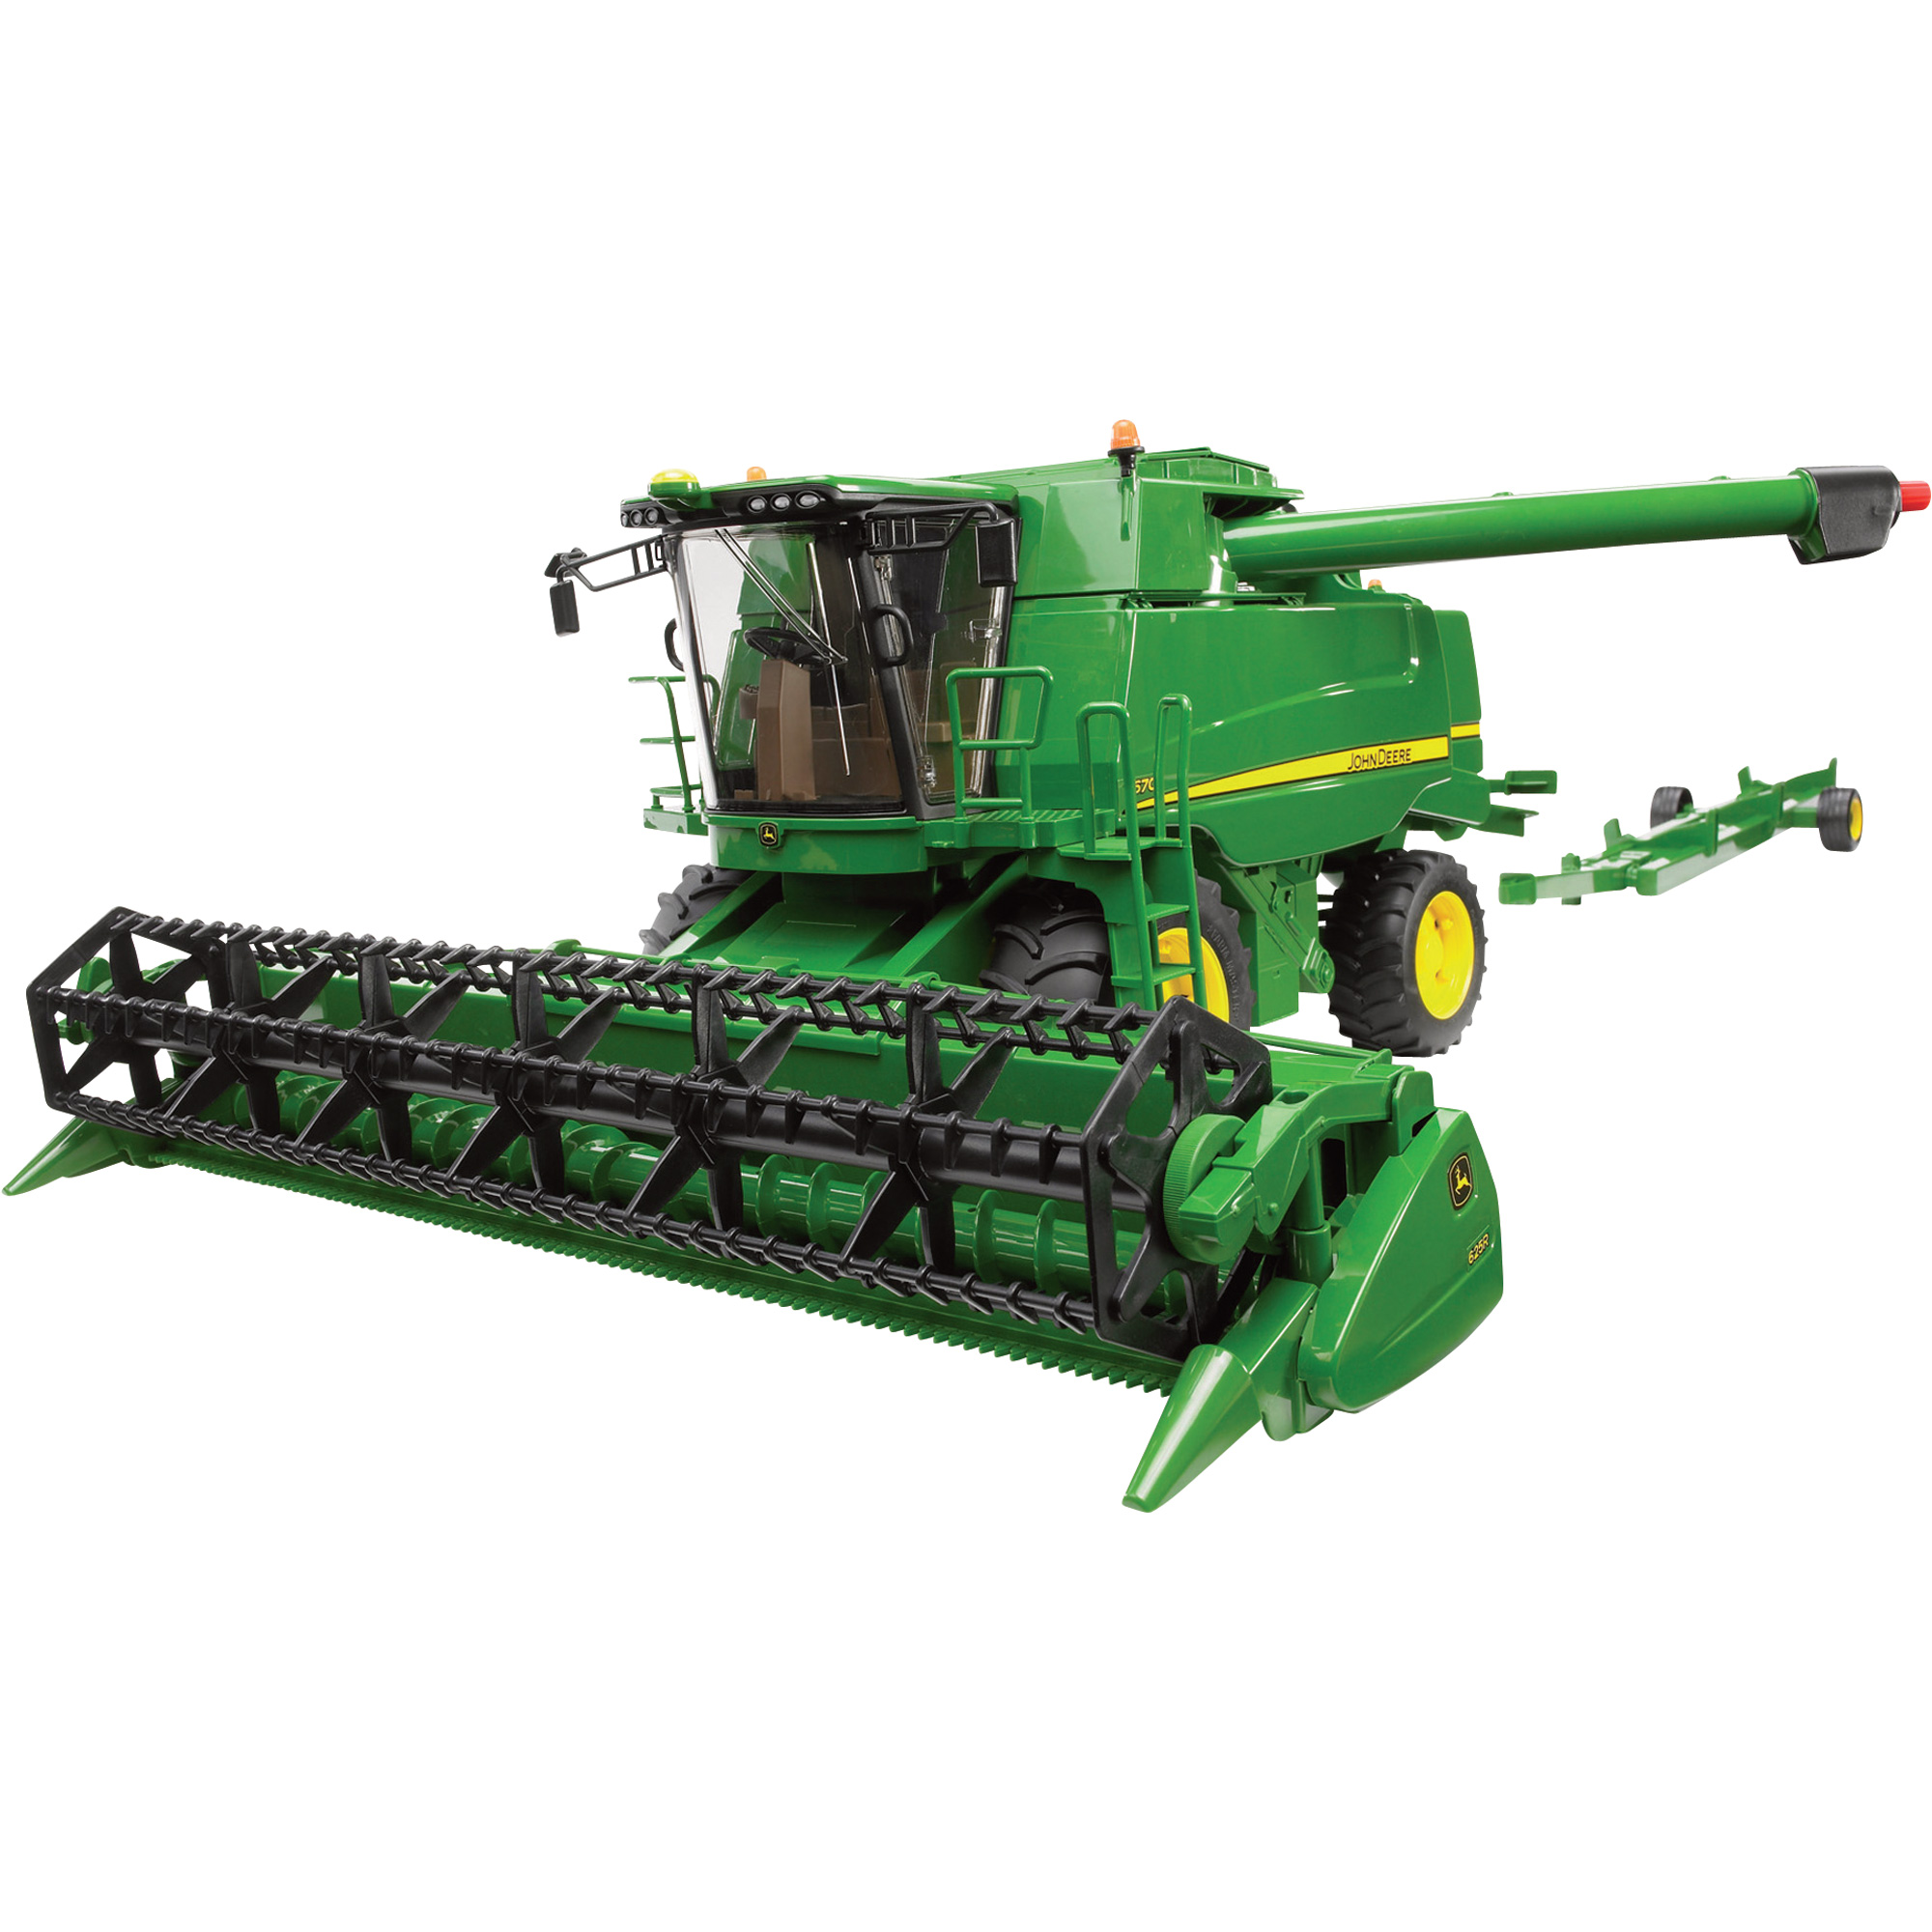 Bruder John Deere Combine Harvester T670i - 1:16 Scale, Model# 09804 ...